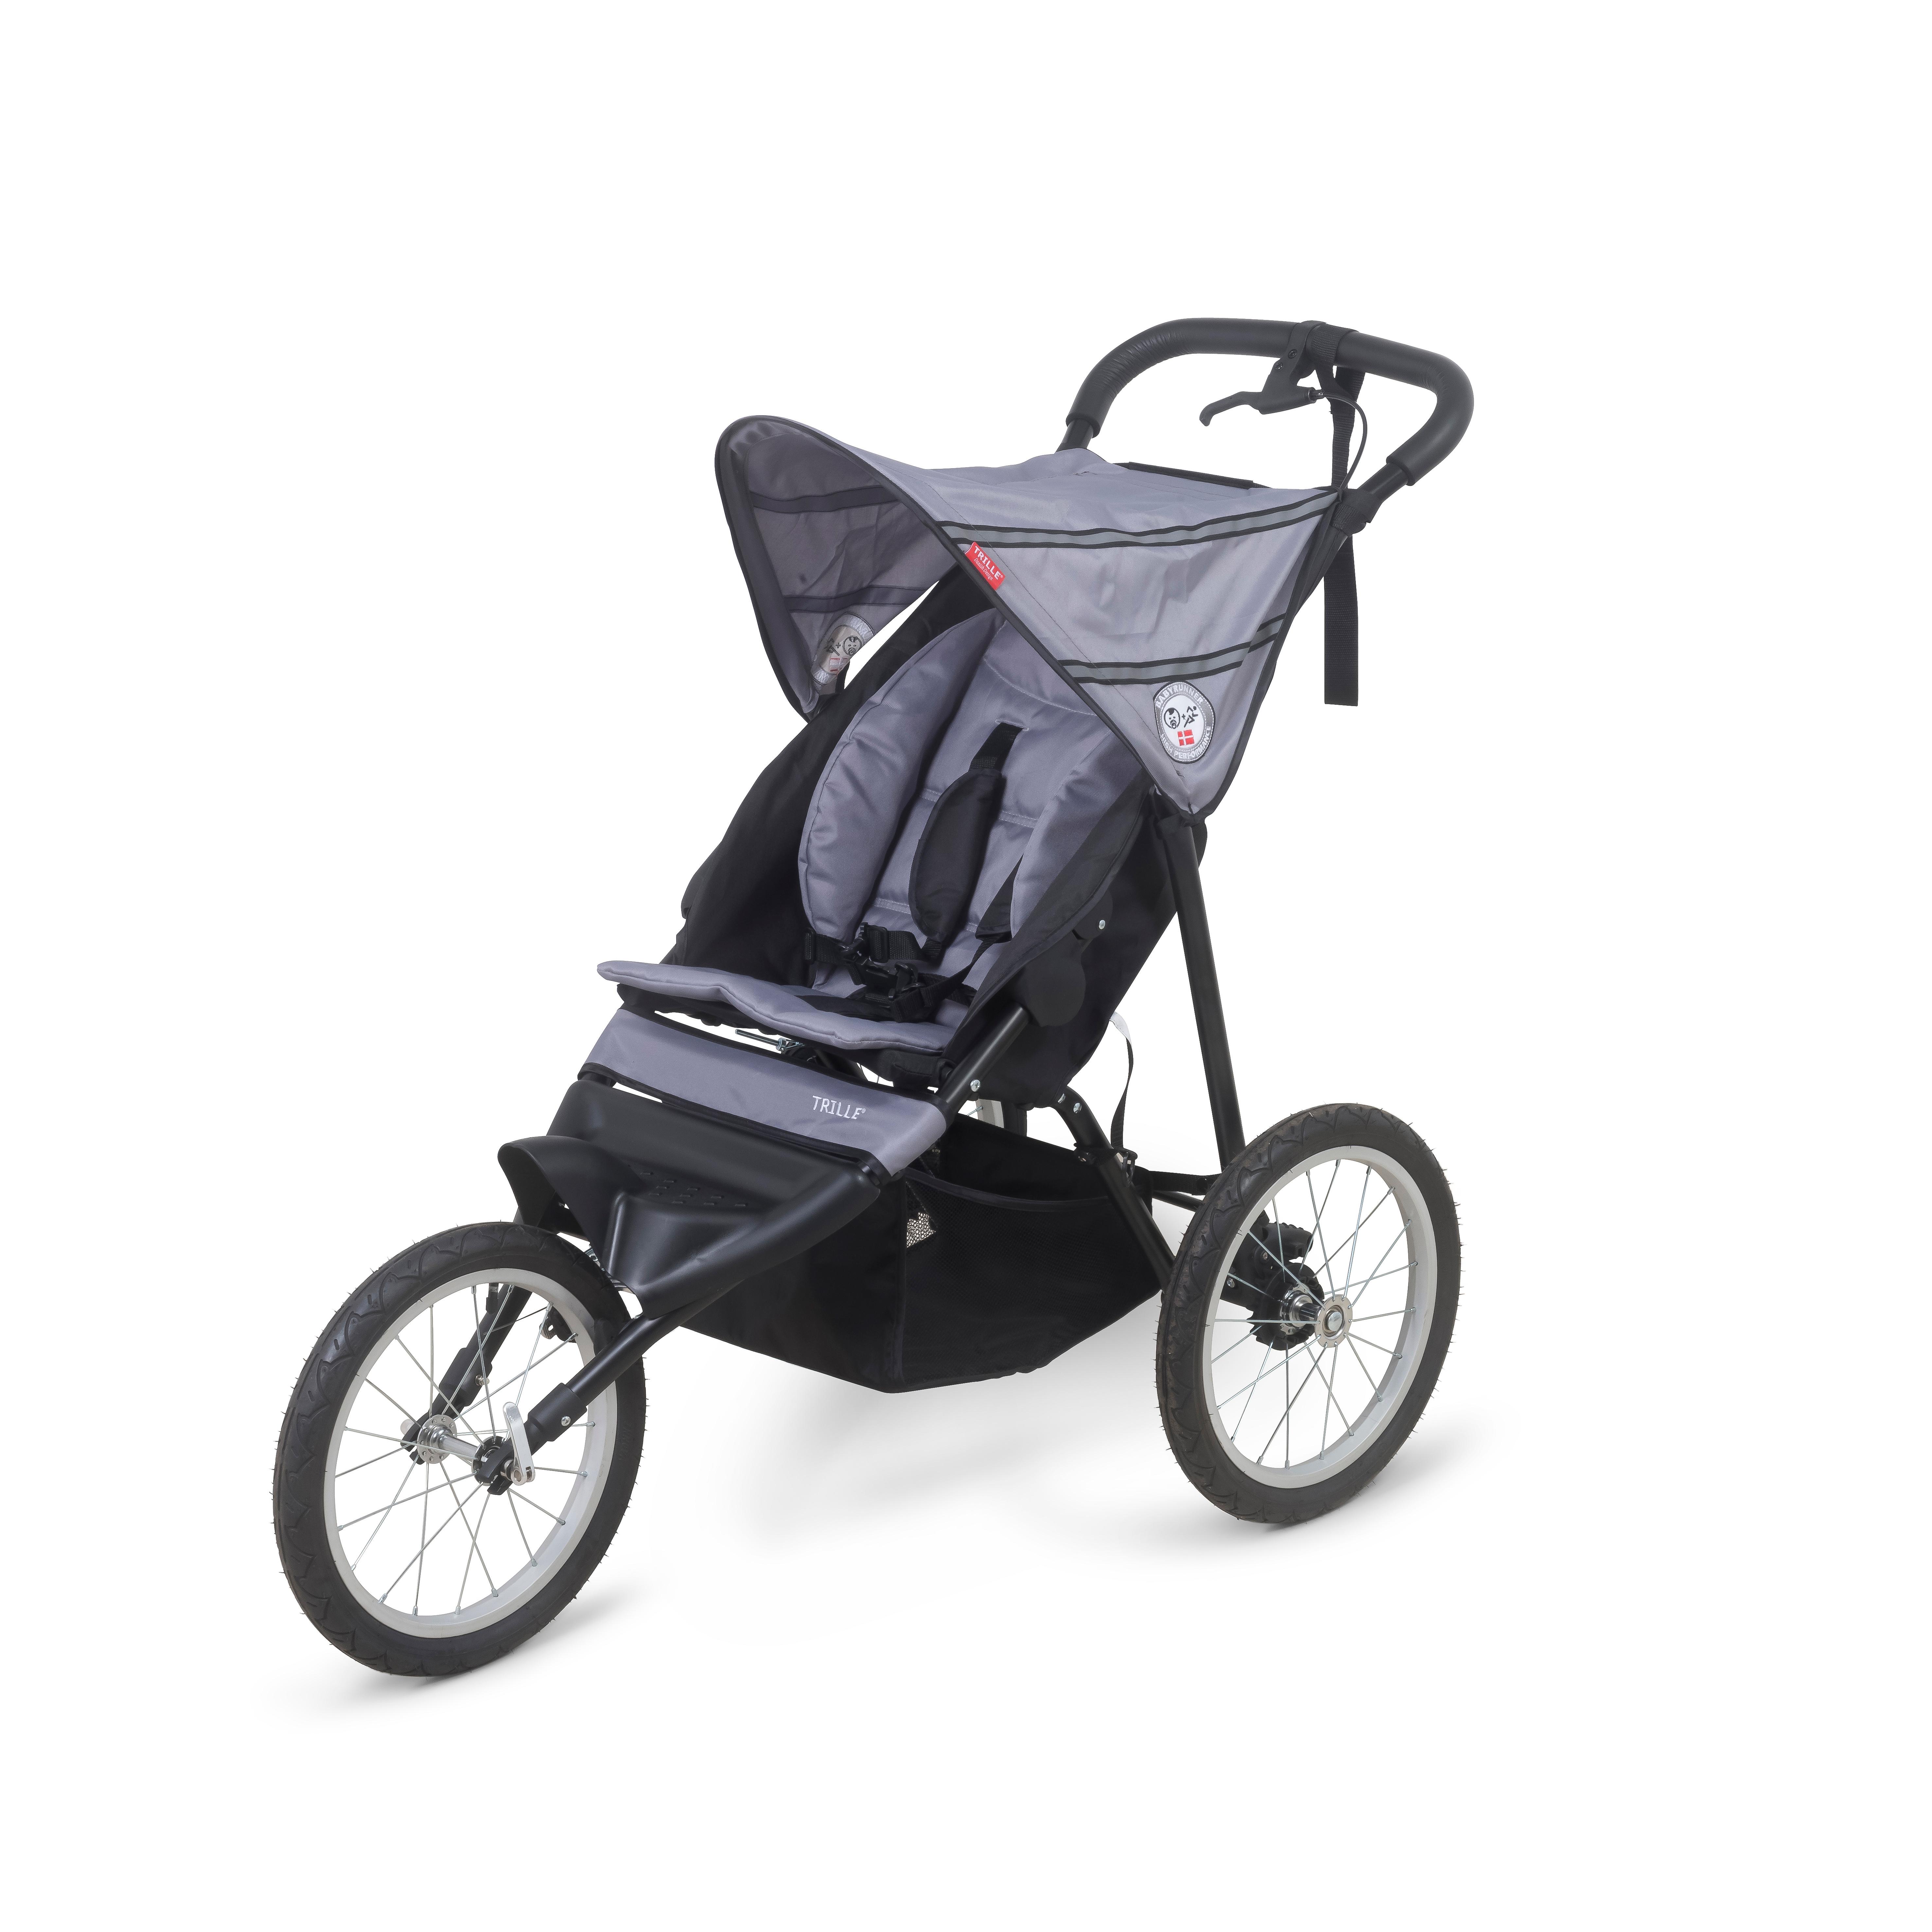 BabyTrold Jogger - Trille - Grå